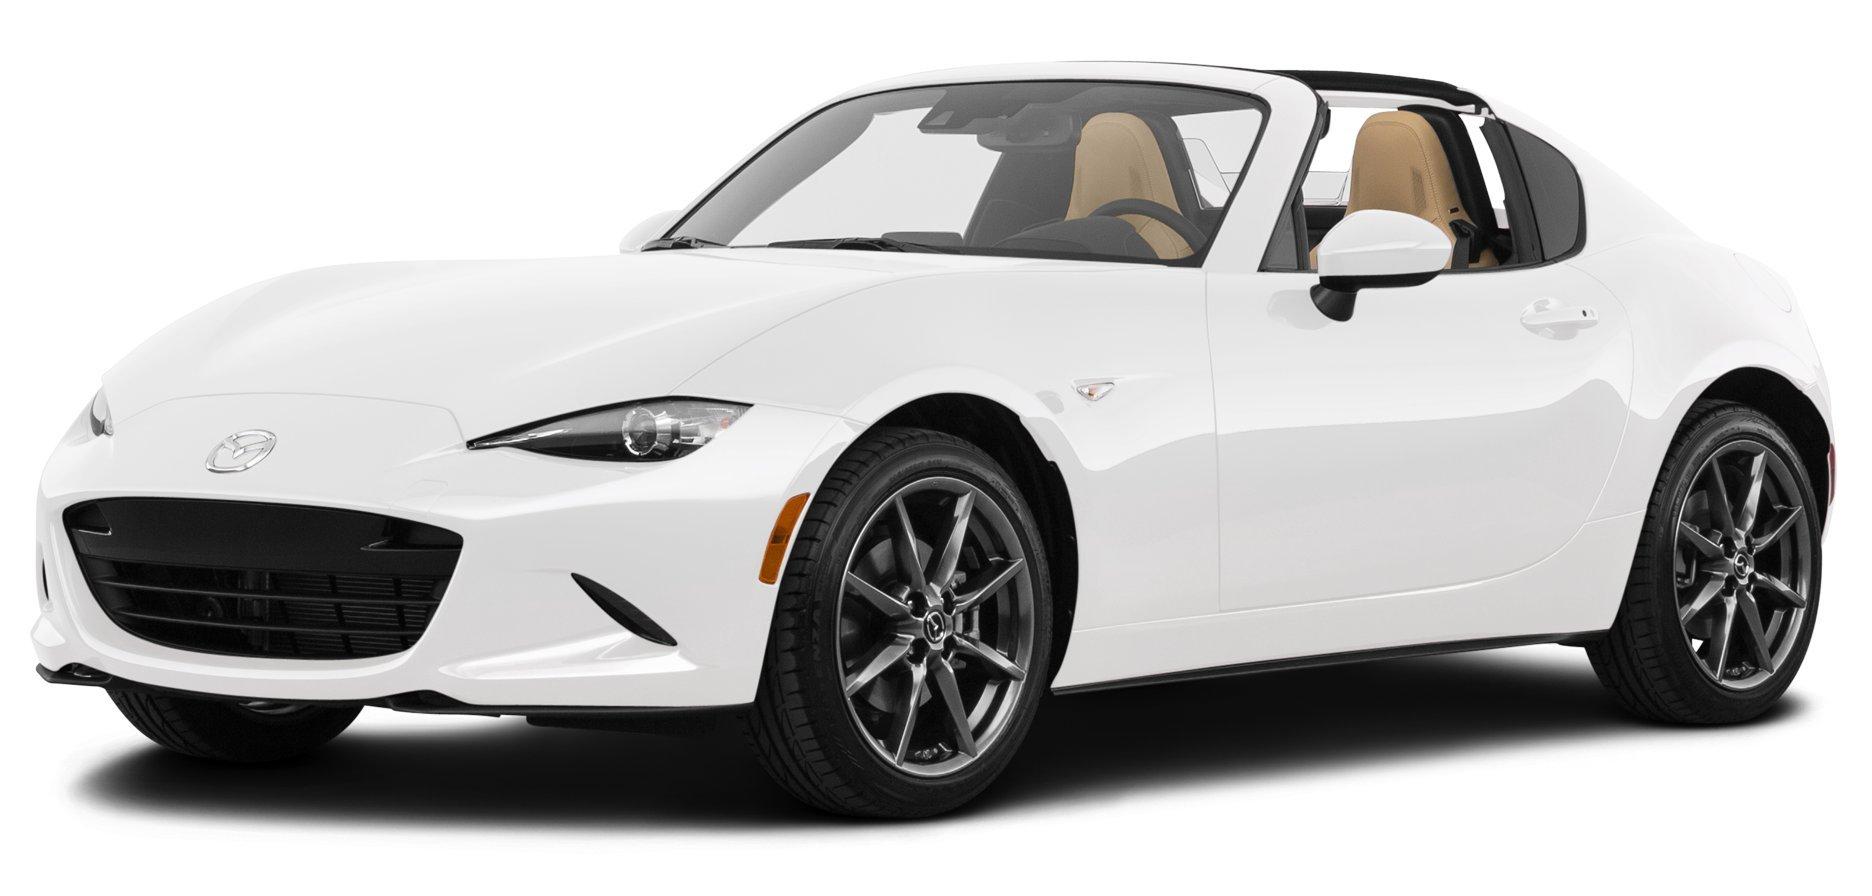 2018 Mazda MX-5 Miata Club, Automatic Transmission ...